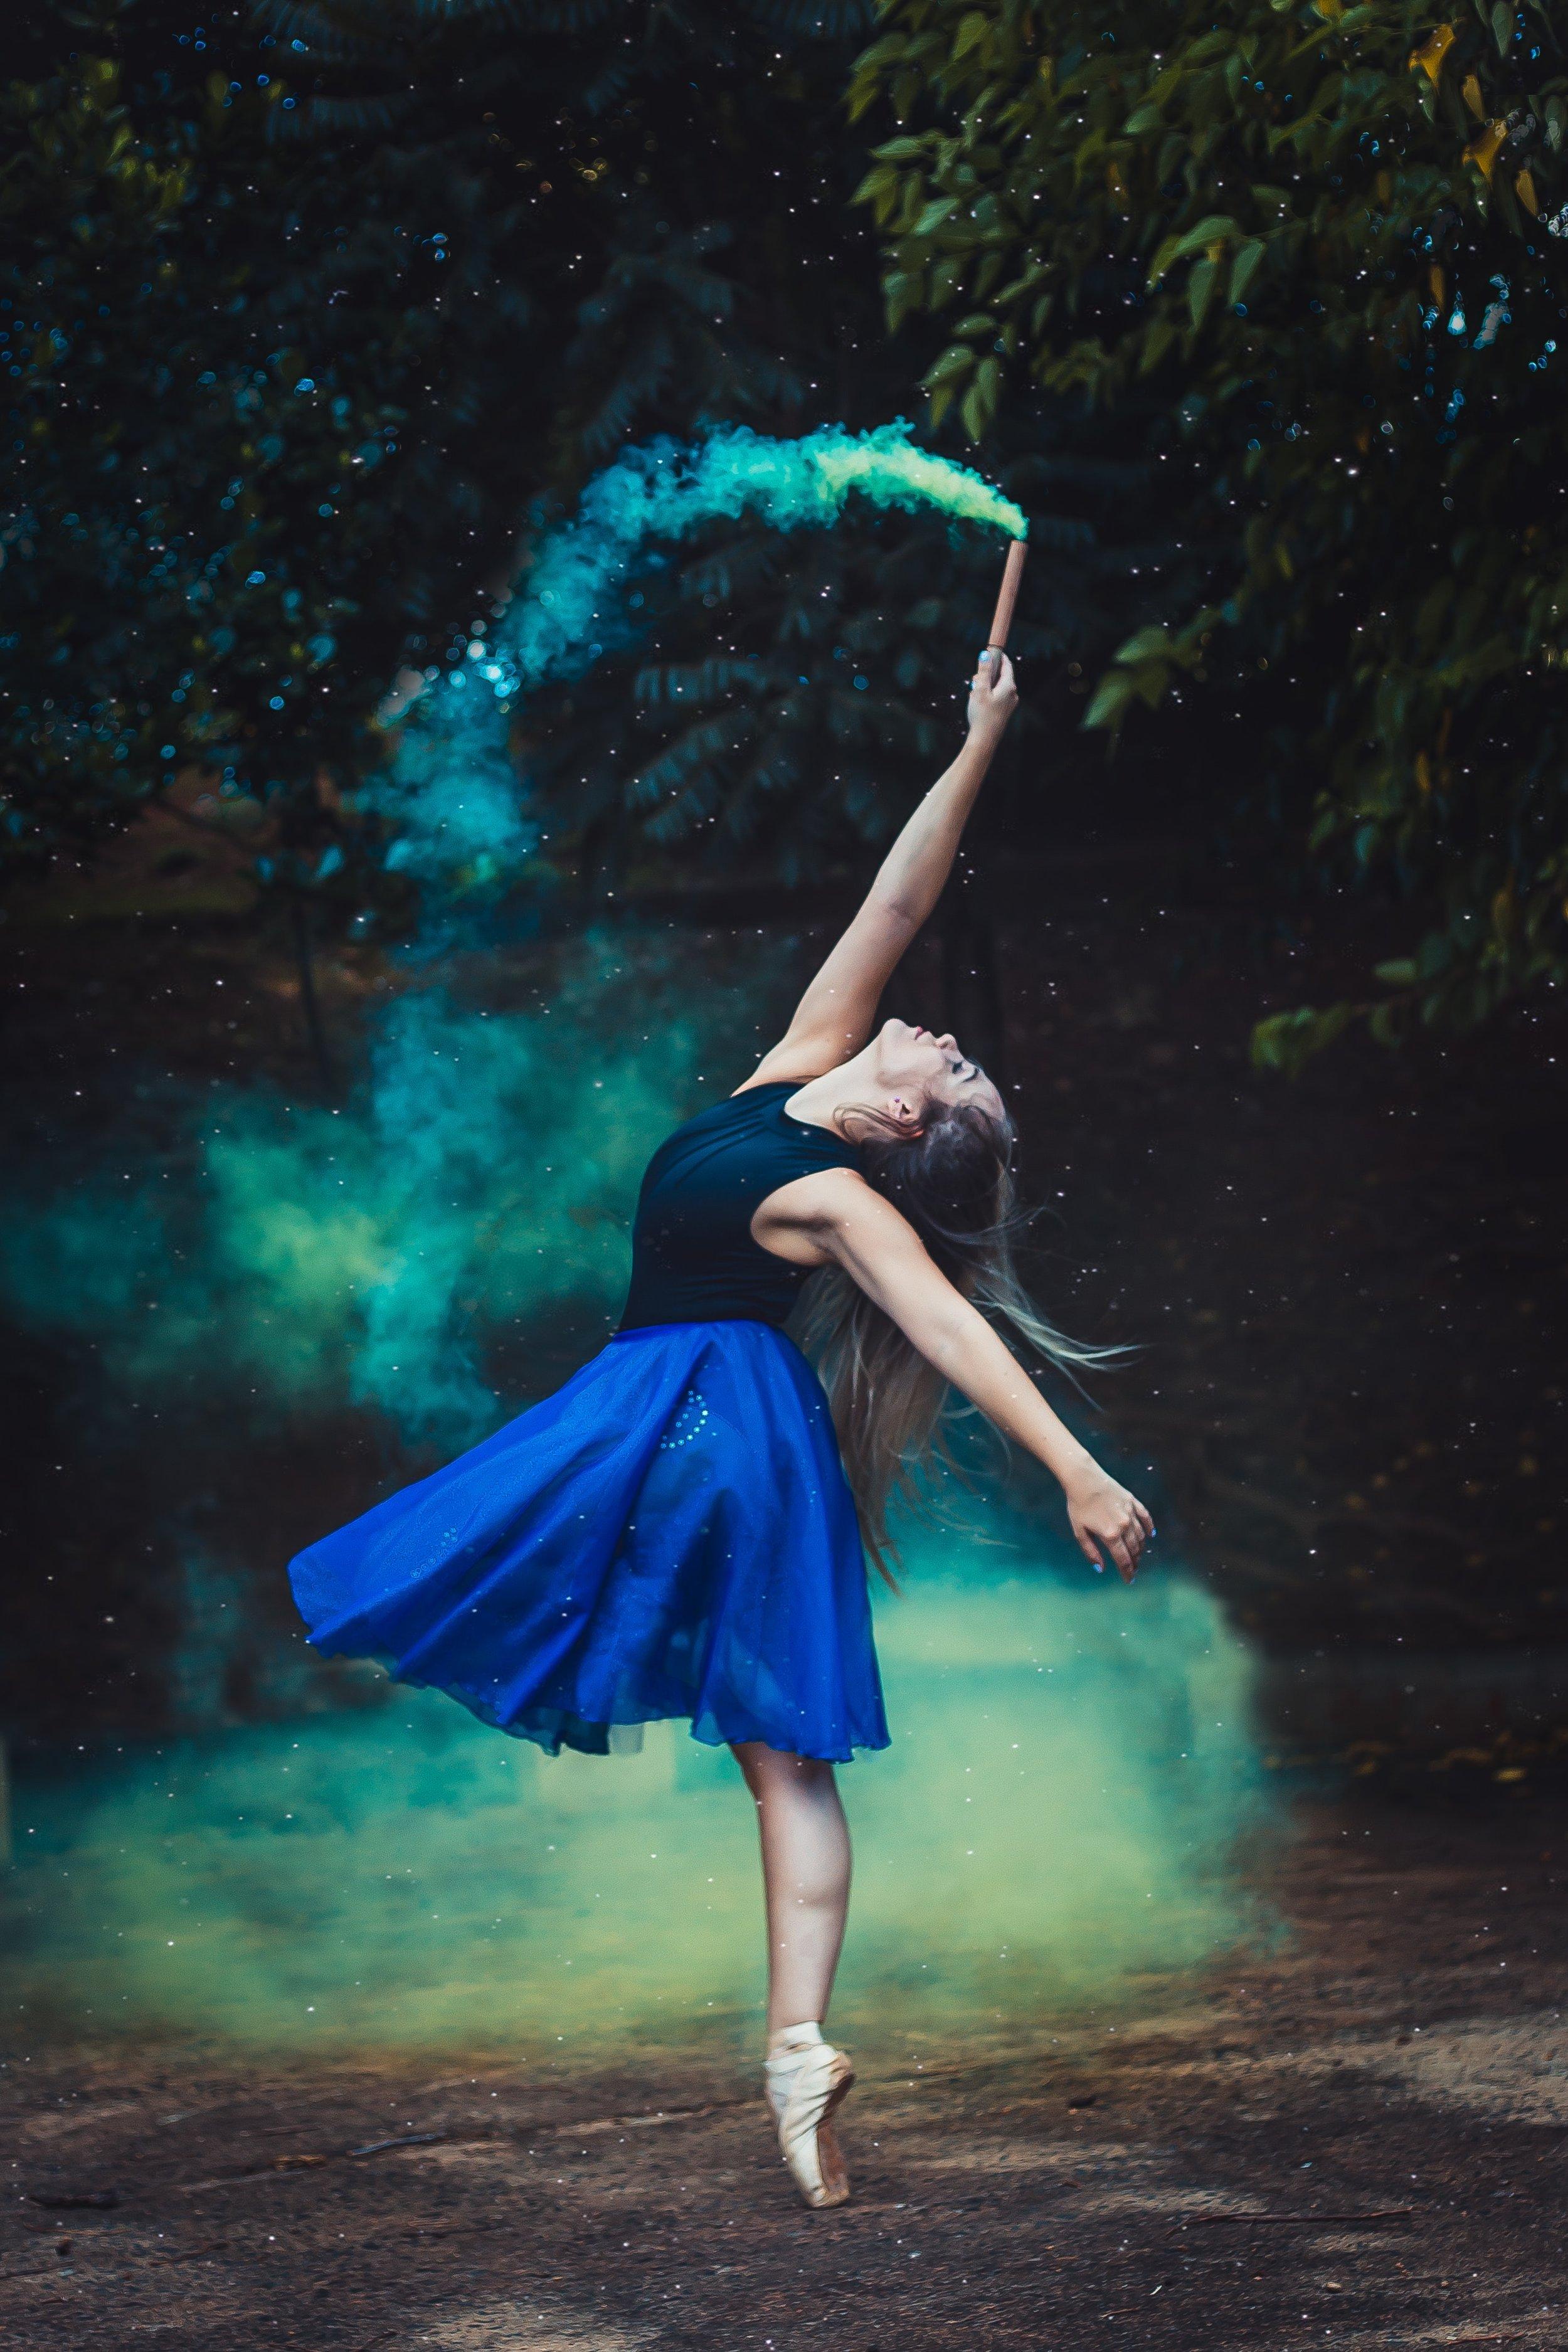 balance-ballerina-ballet-1886694.jpg